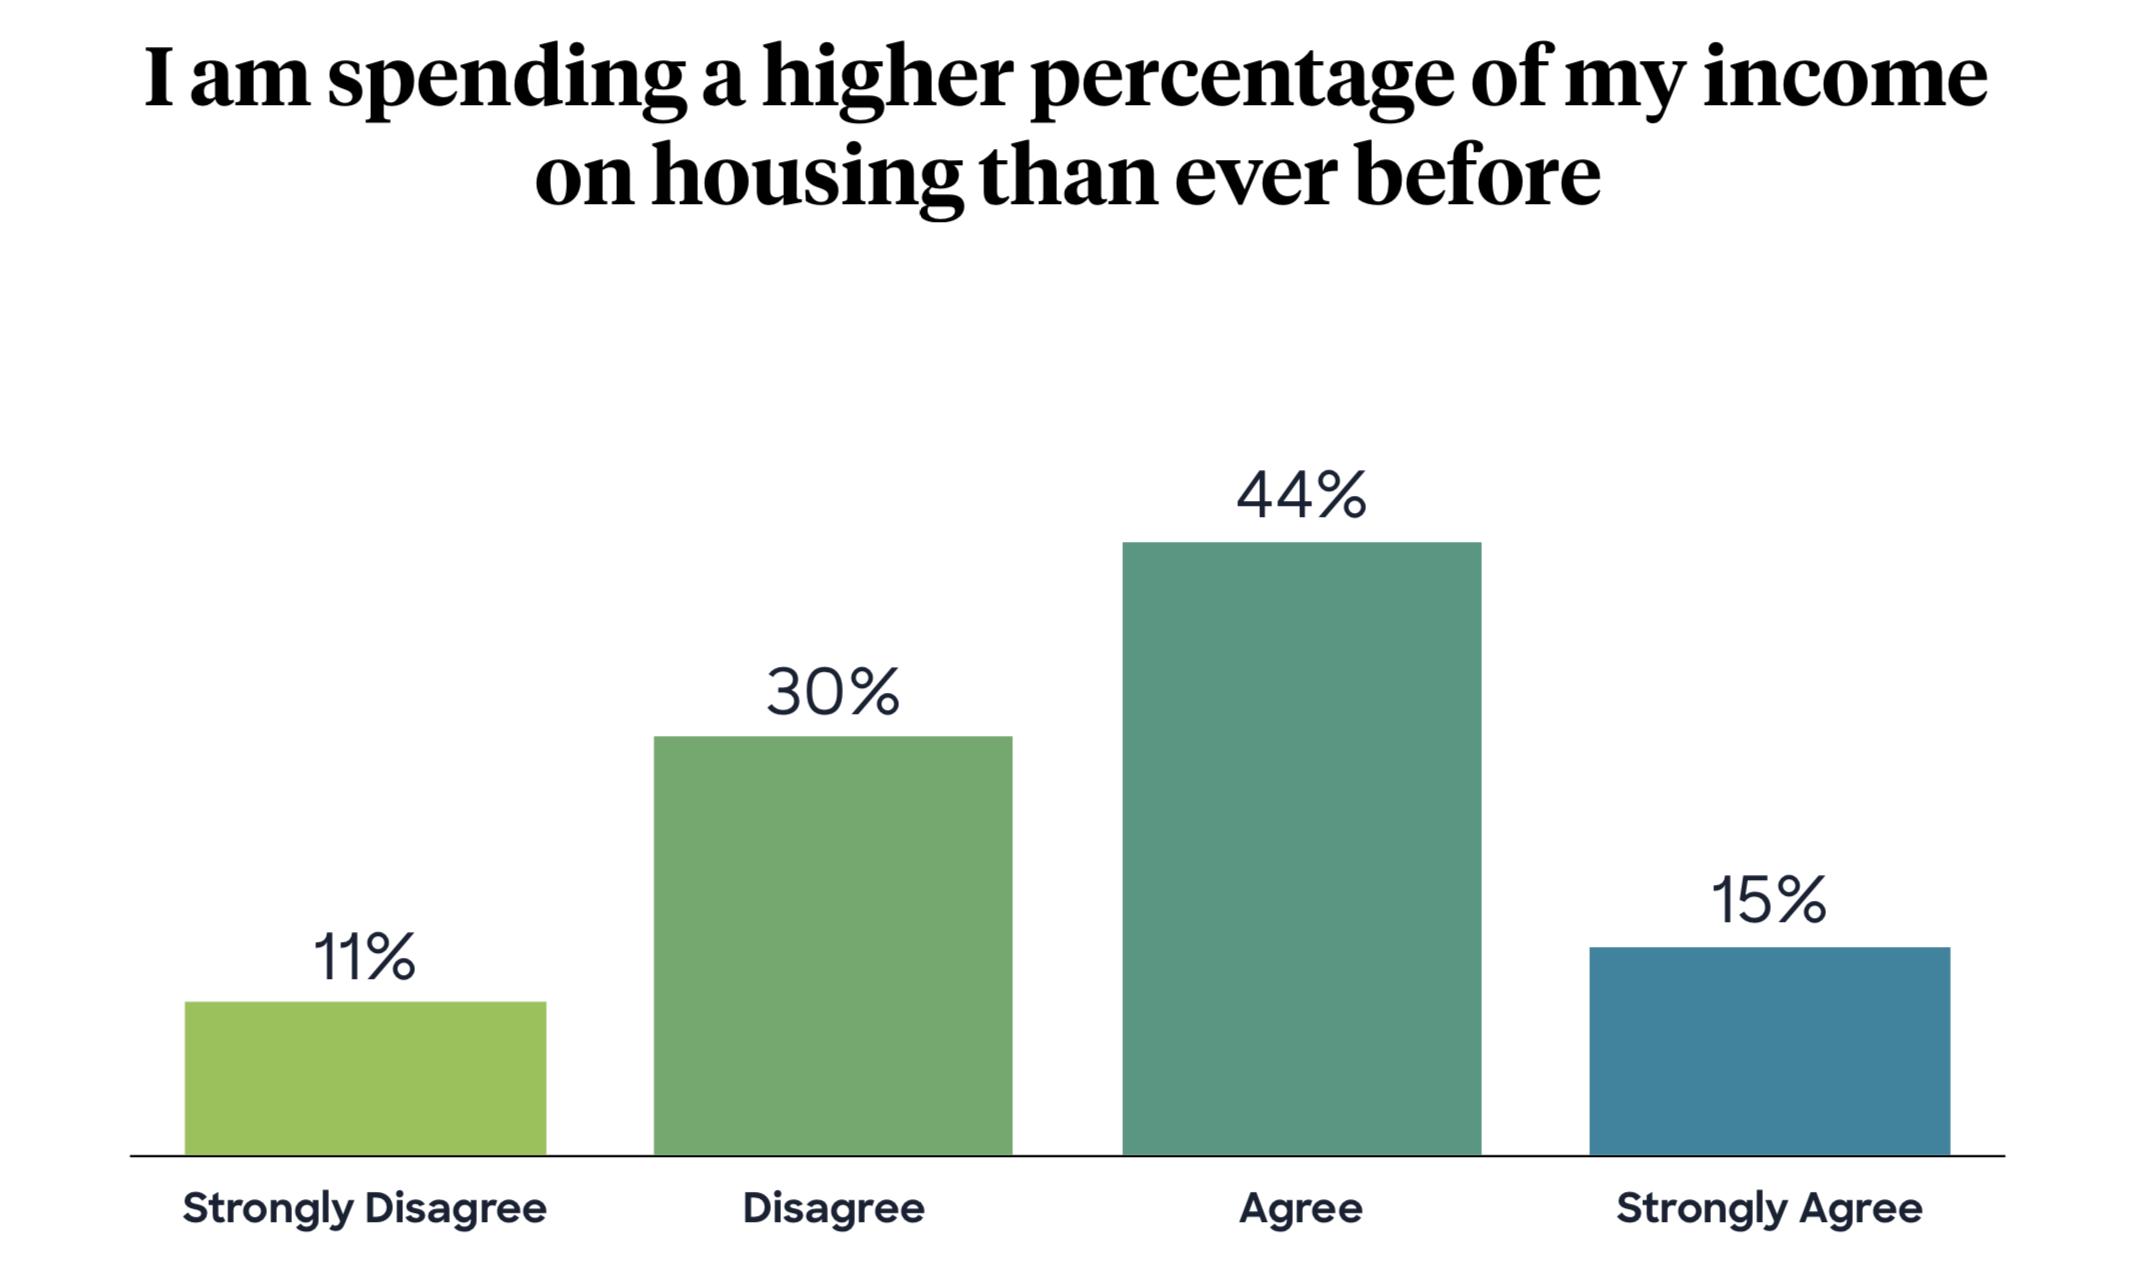 Denver Homeowners House Rich Cash Poor